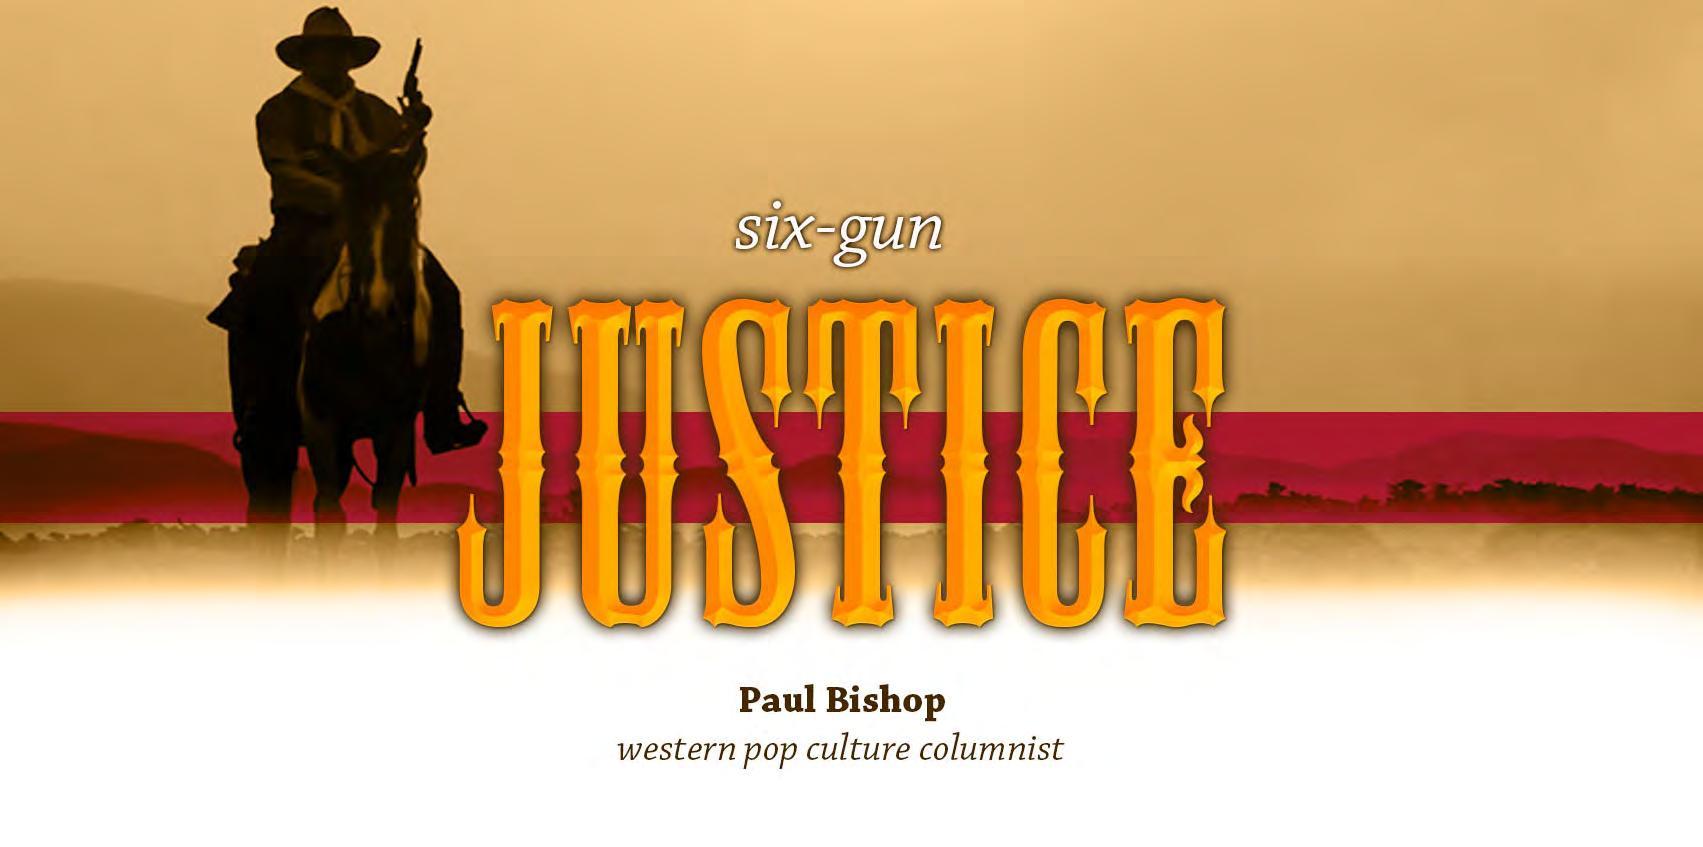 Page 8 of Sixgun Justice by Paul Bishop